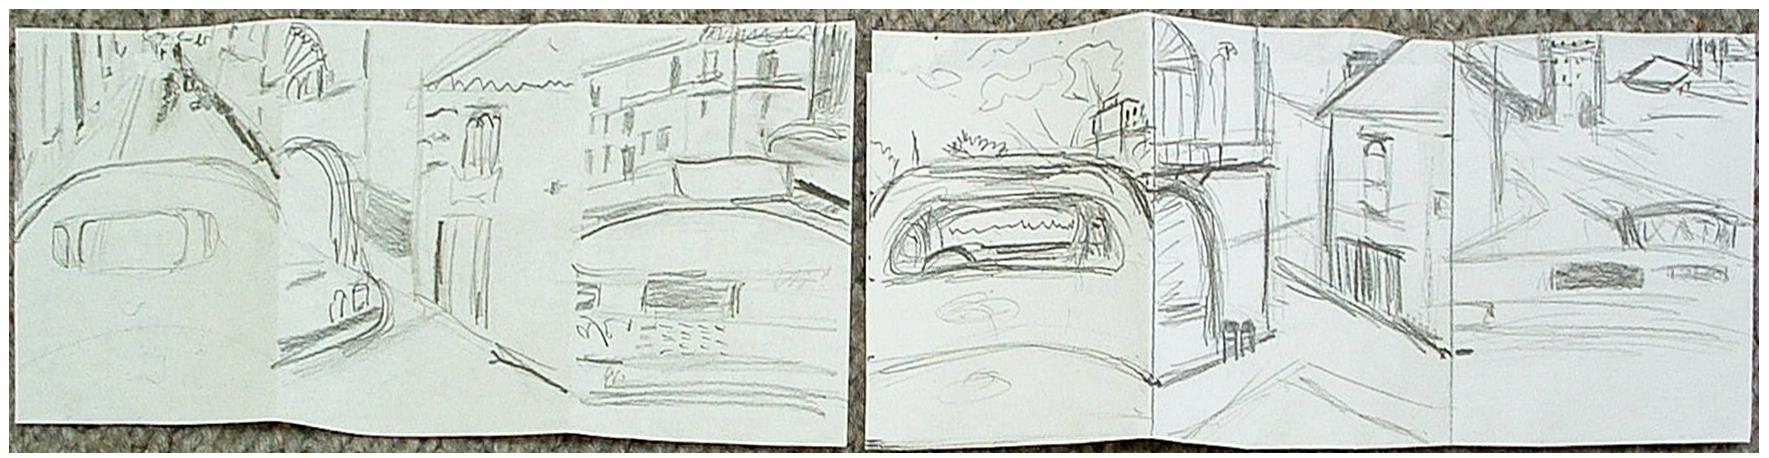 Sketch for Cuba